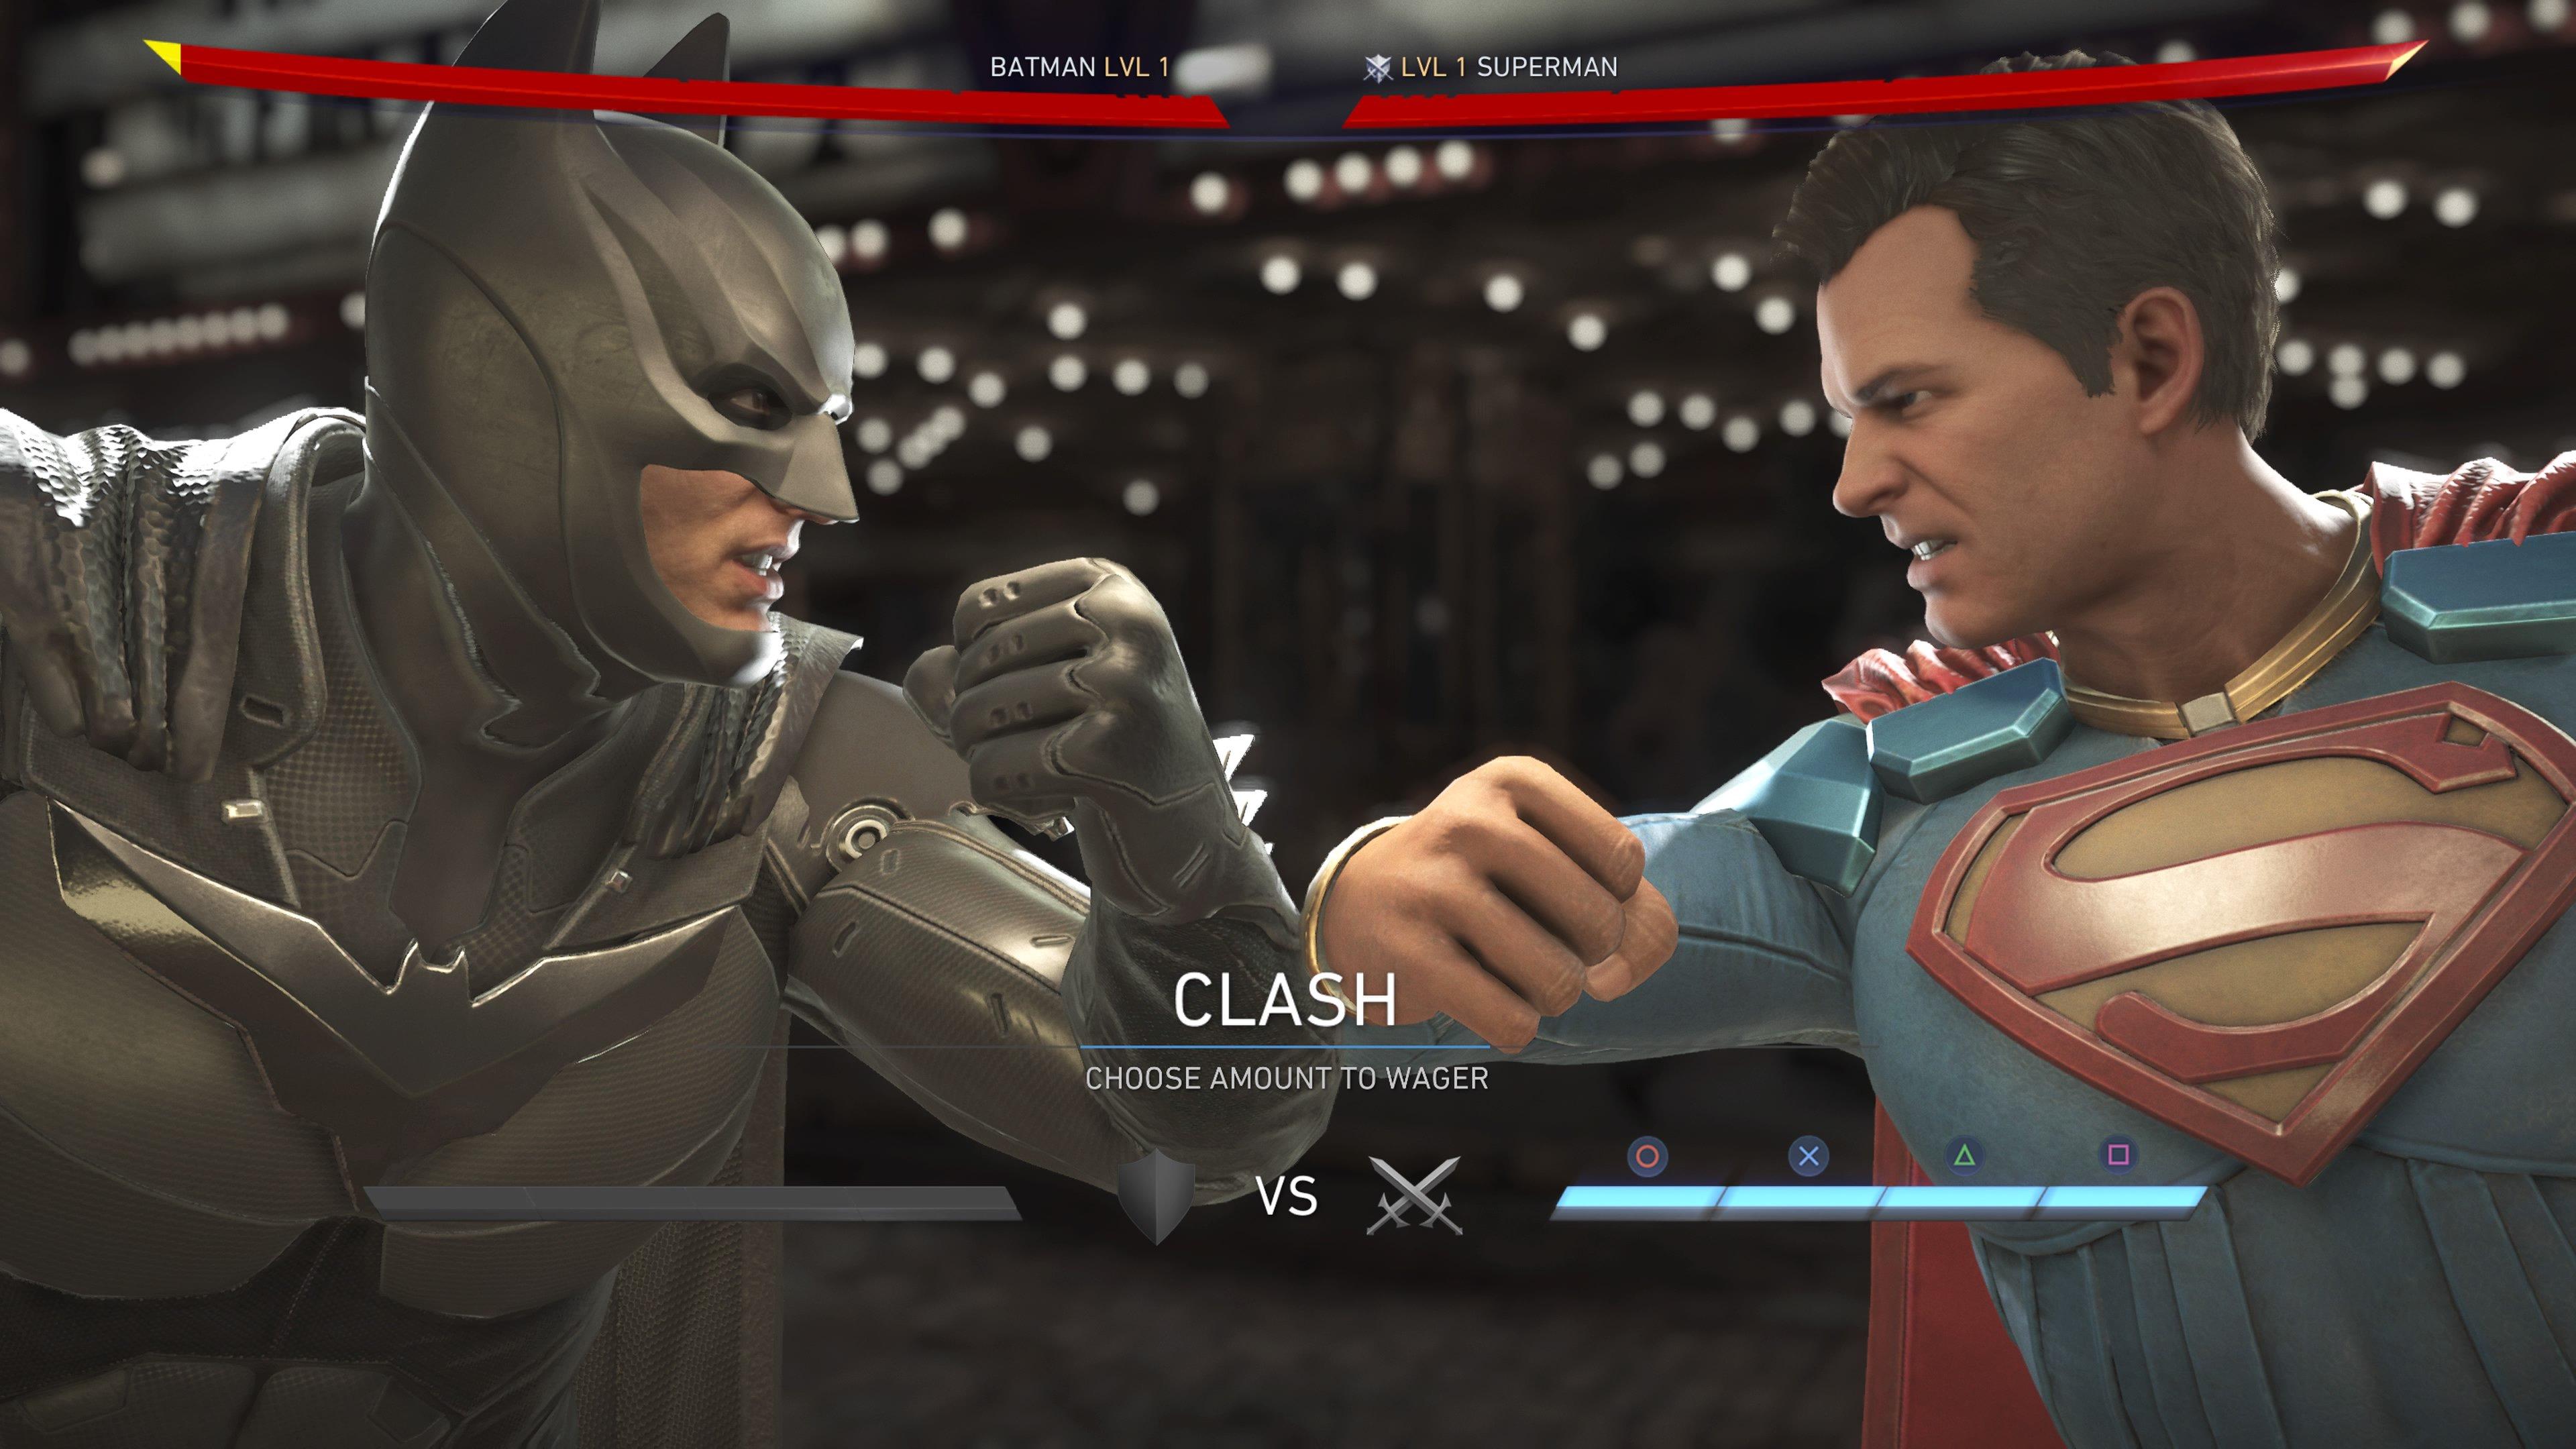 Batman Clashing with Superman